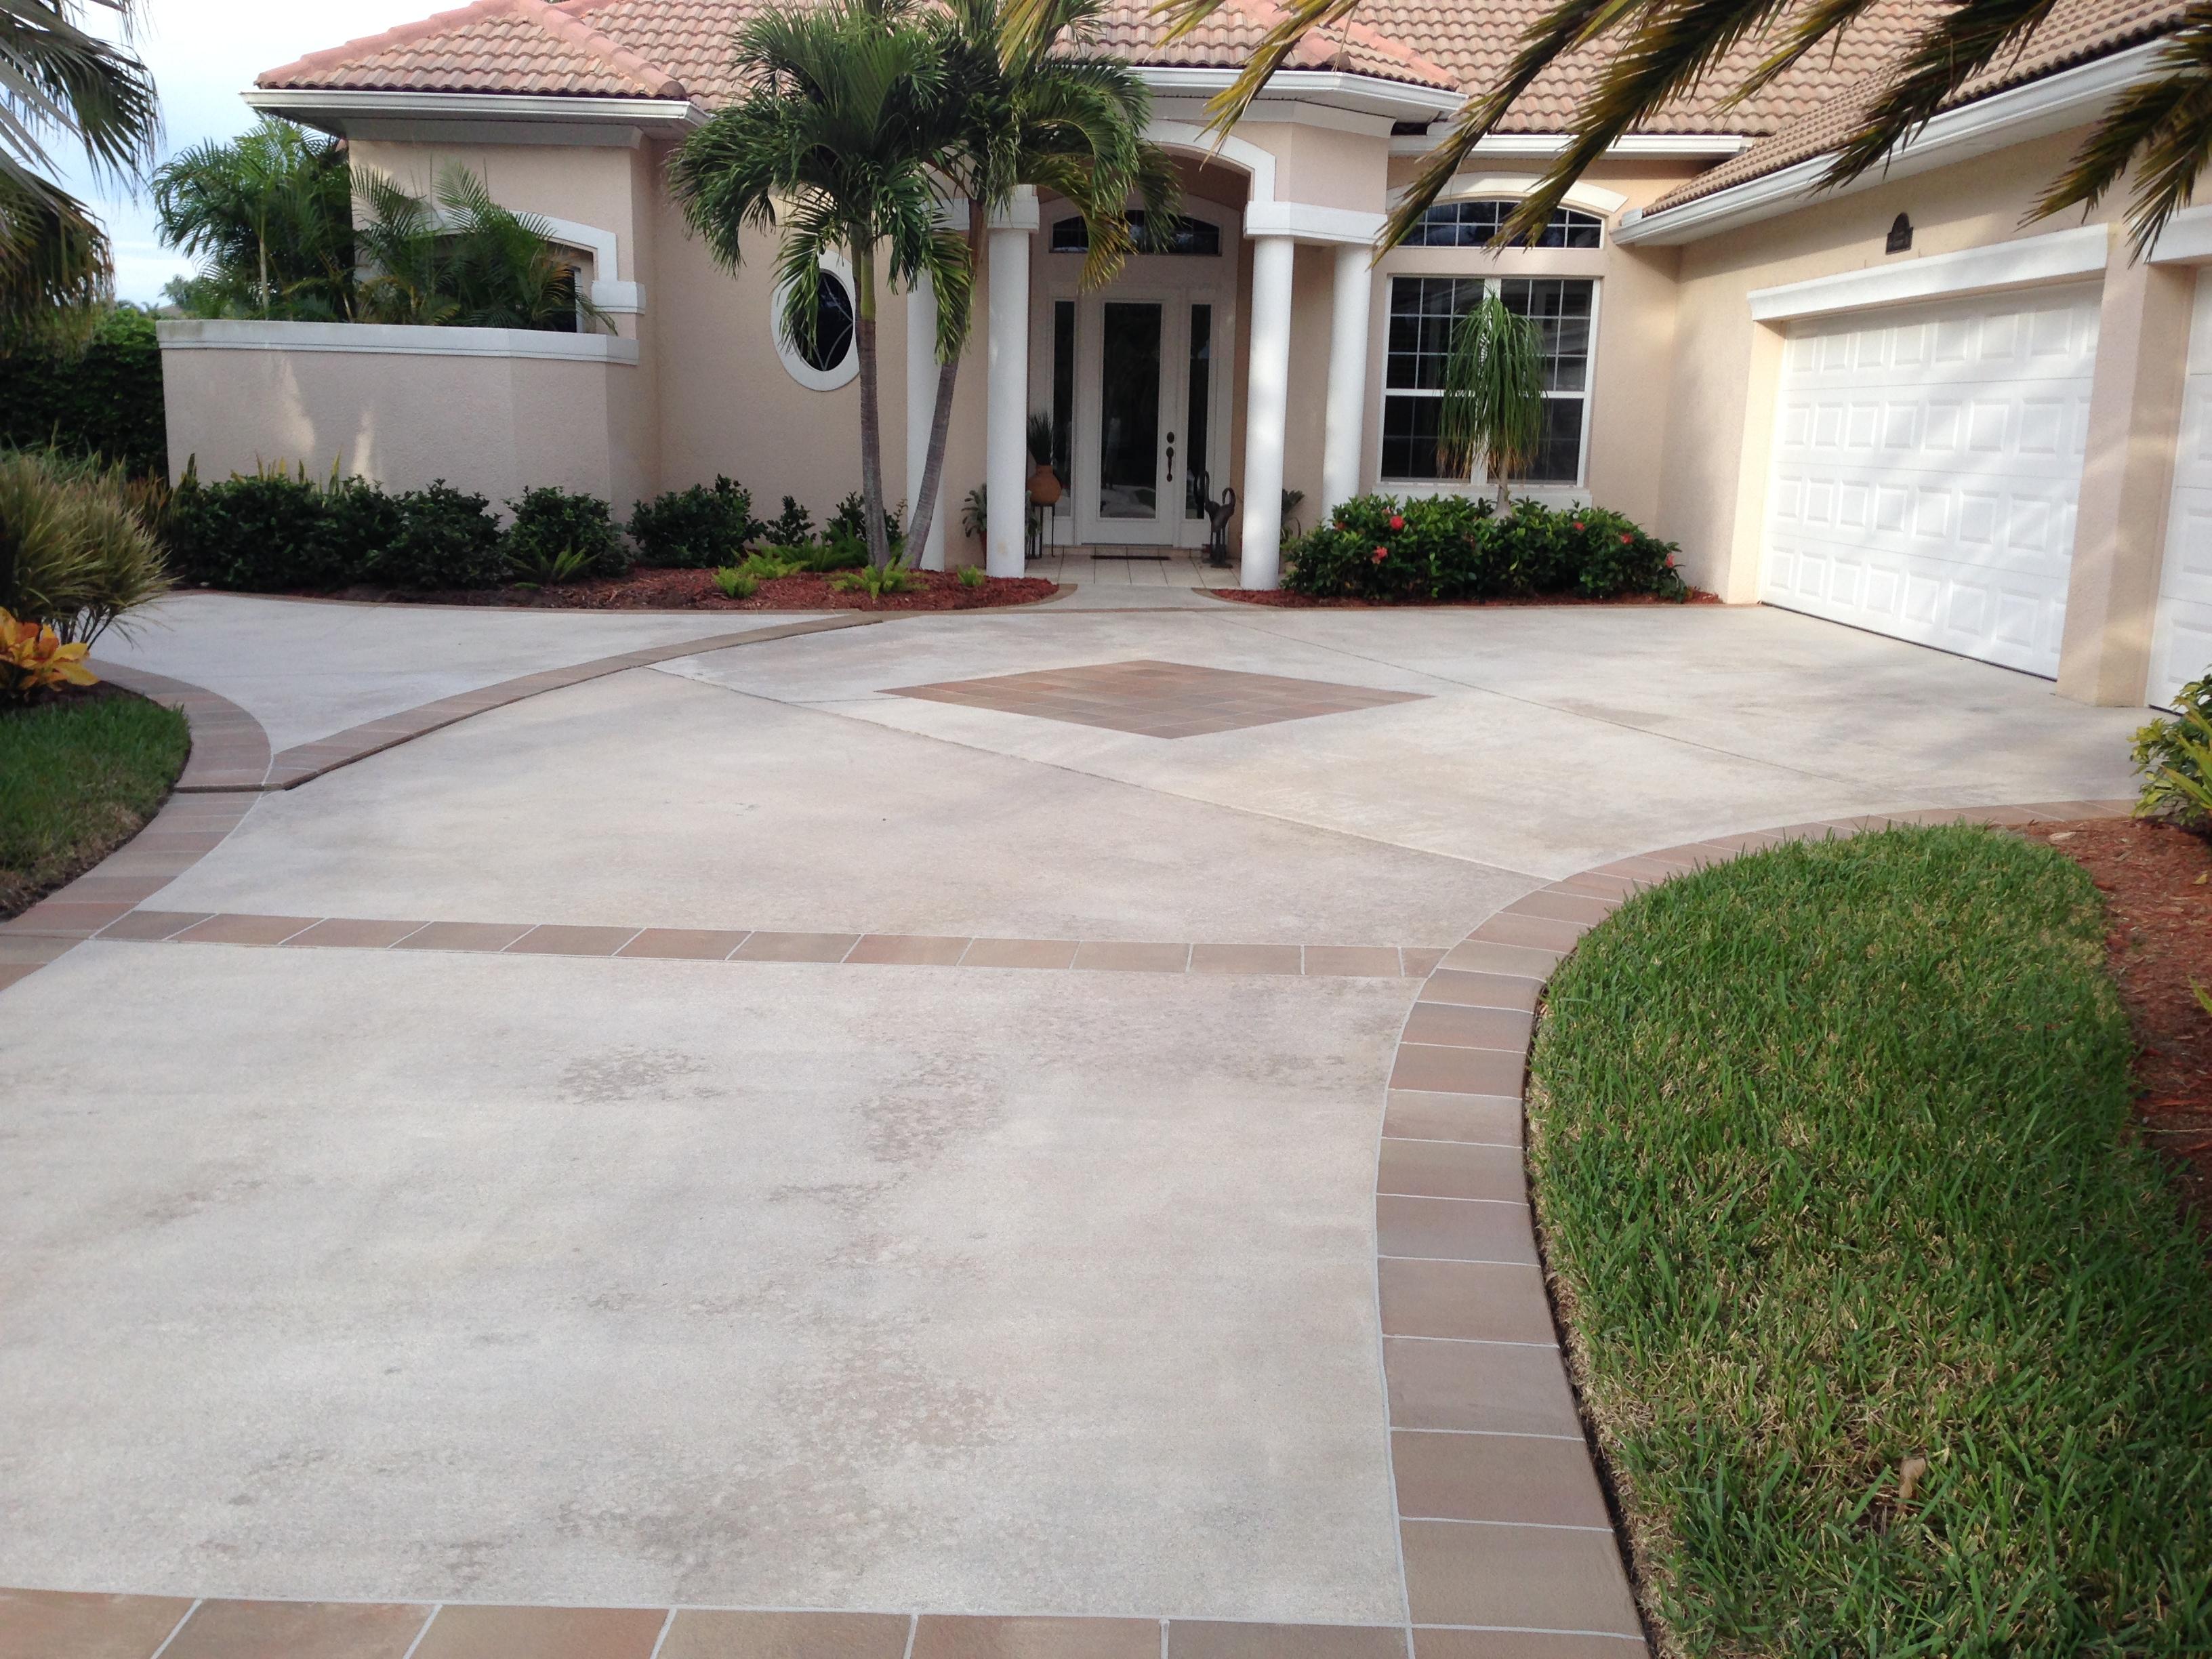 Concrete Designs Florida  driveway decorating ideas